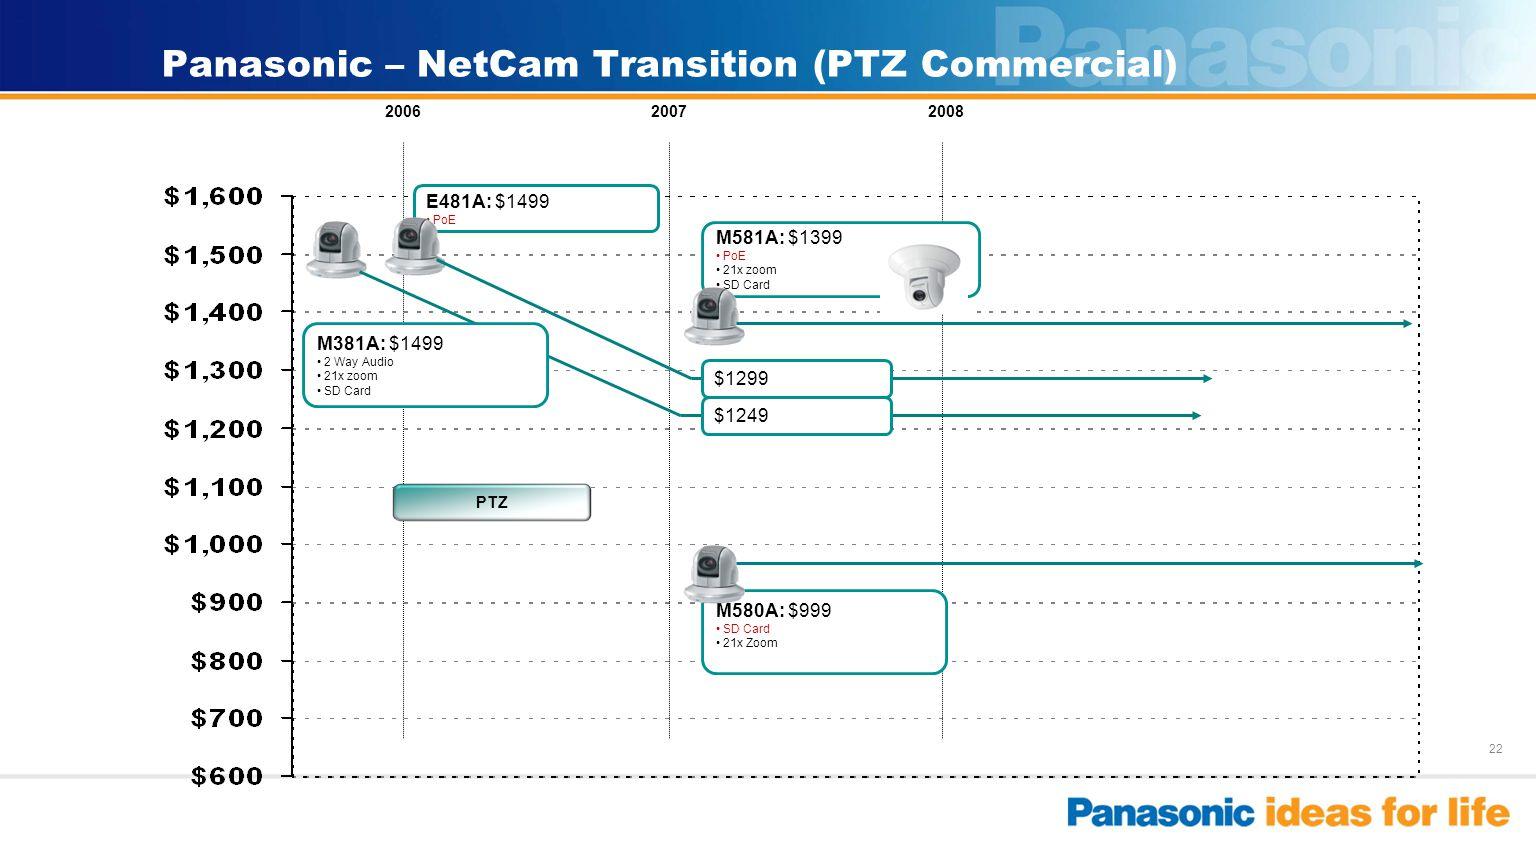 22 Panasonic – NetCam Transition (PTZ Commercial) 200820072006 PTZ E481A: $1499 PoE M580A: $999 SD Card 21x Zoom M581A: $1399 PoE 21x zoom SD Card $12